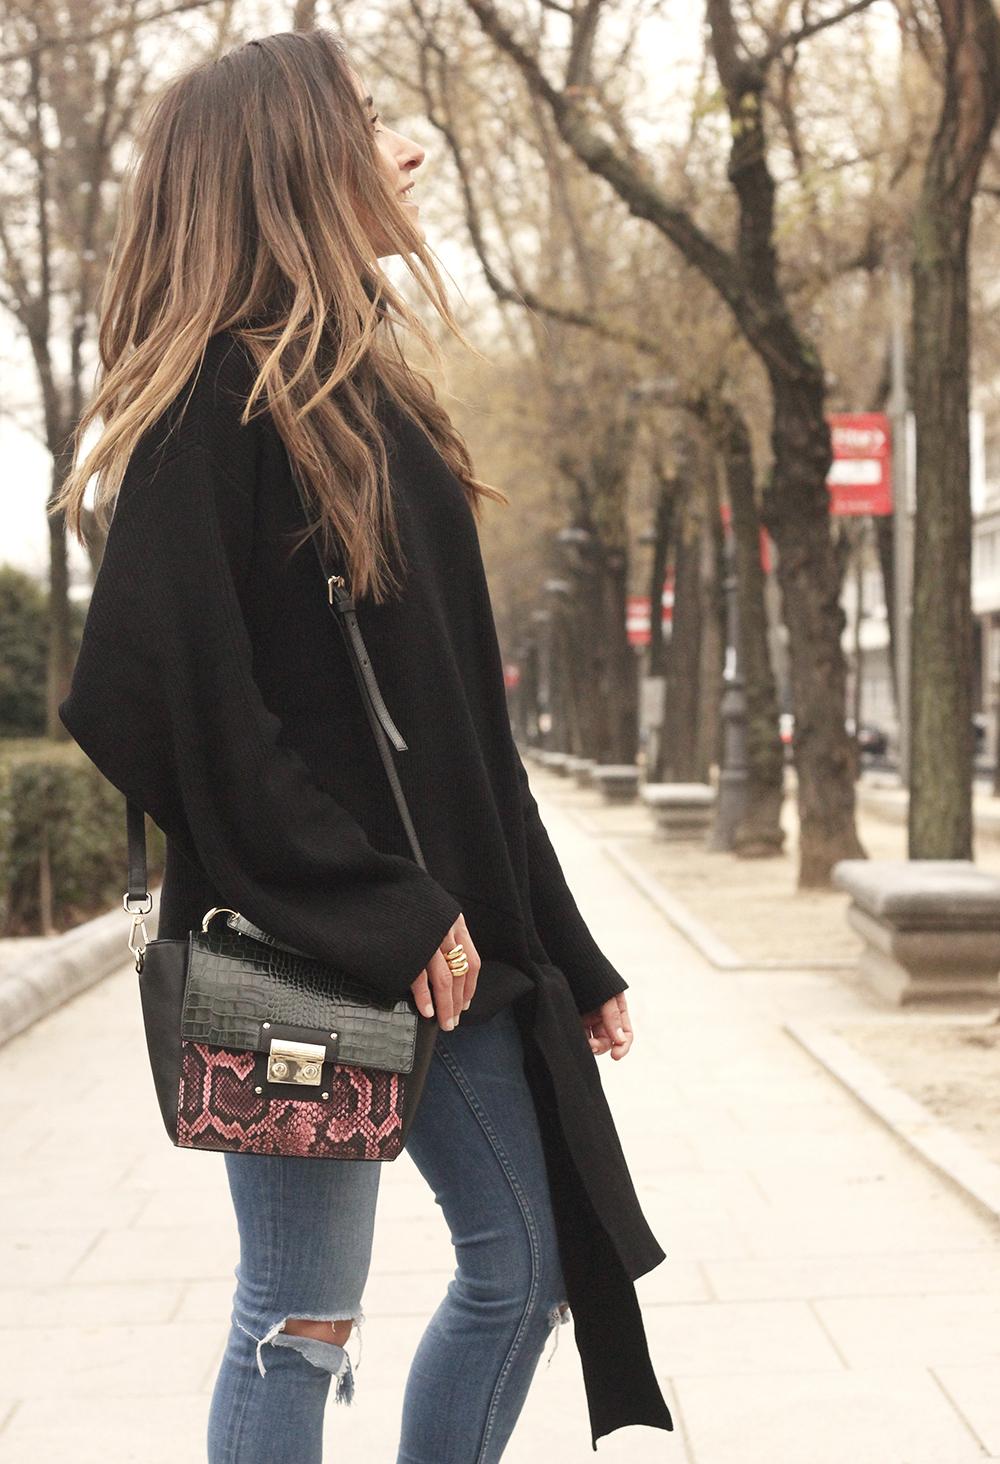 Black turtleneck sweater Uterqüe black ankle boots winter oufit 201813